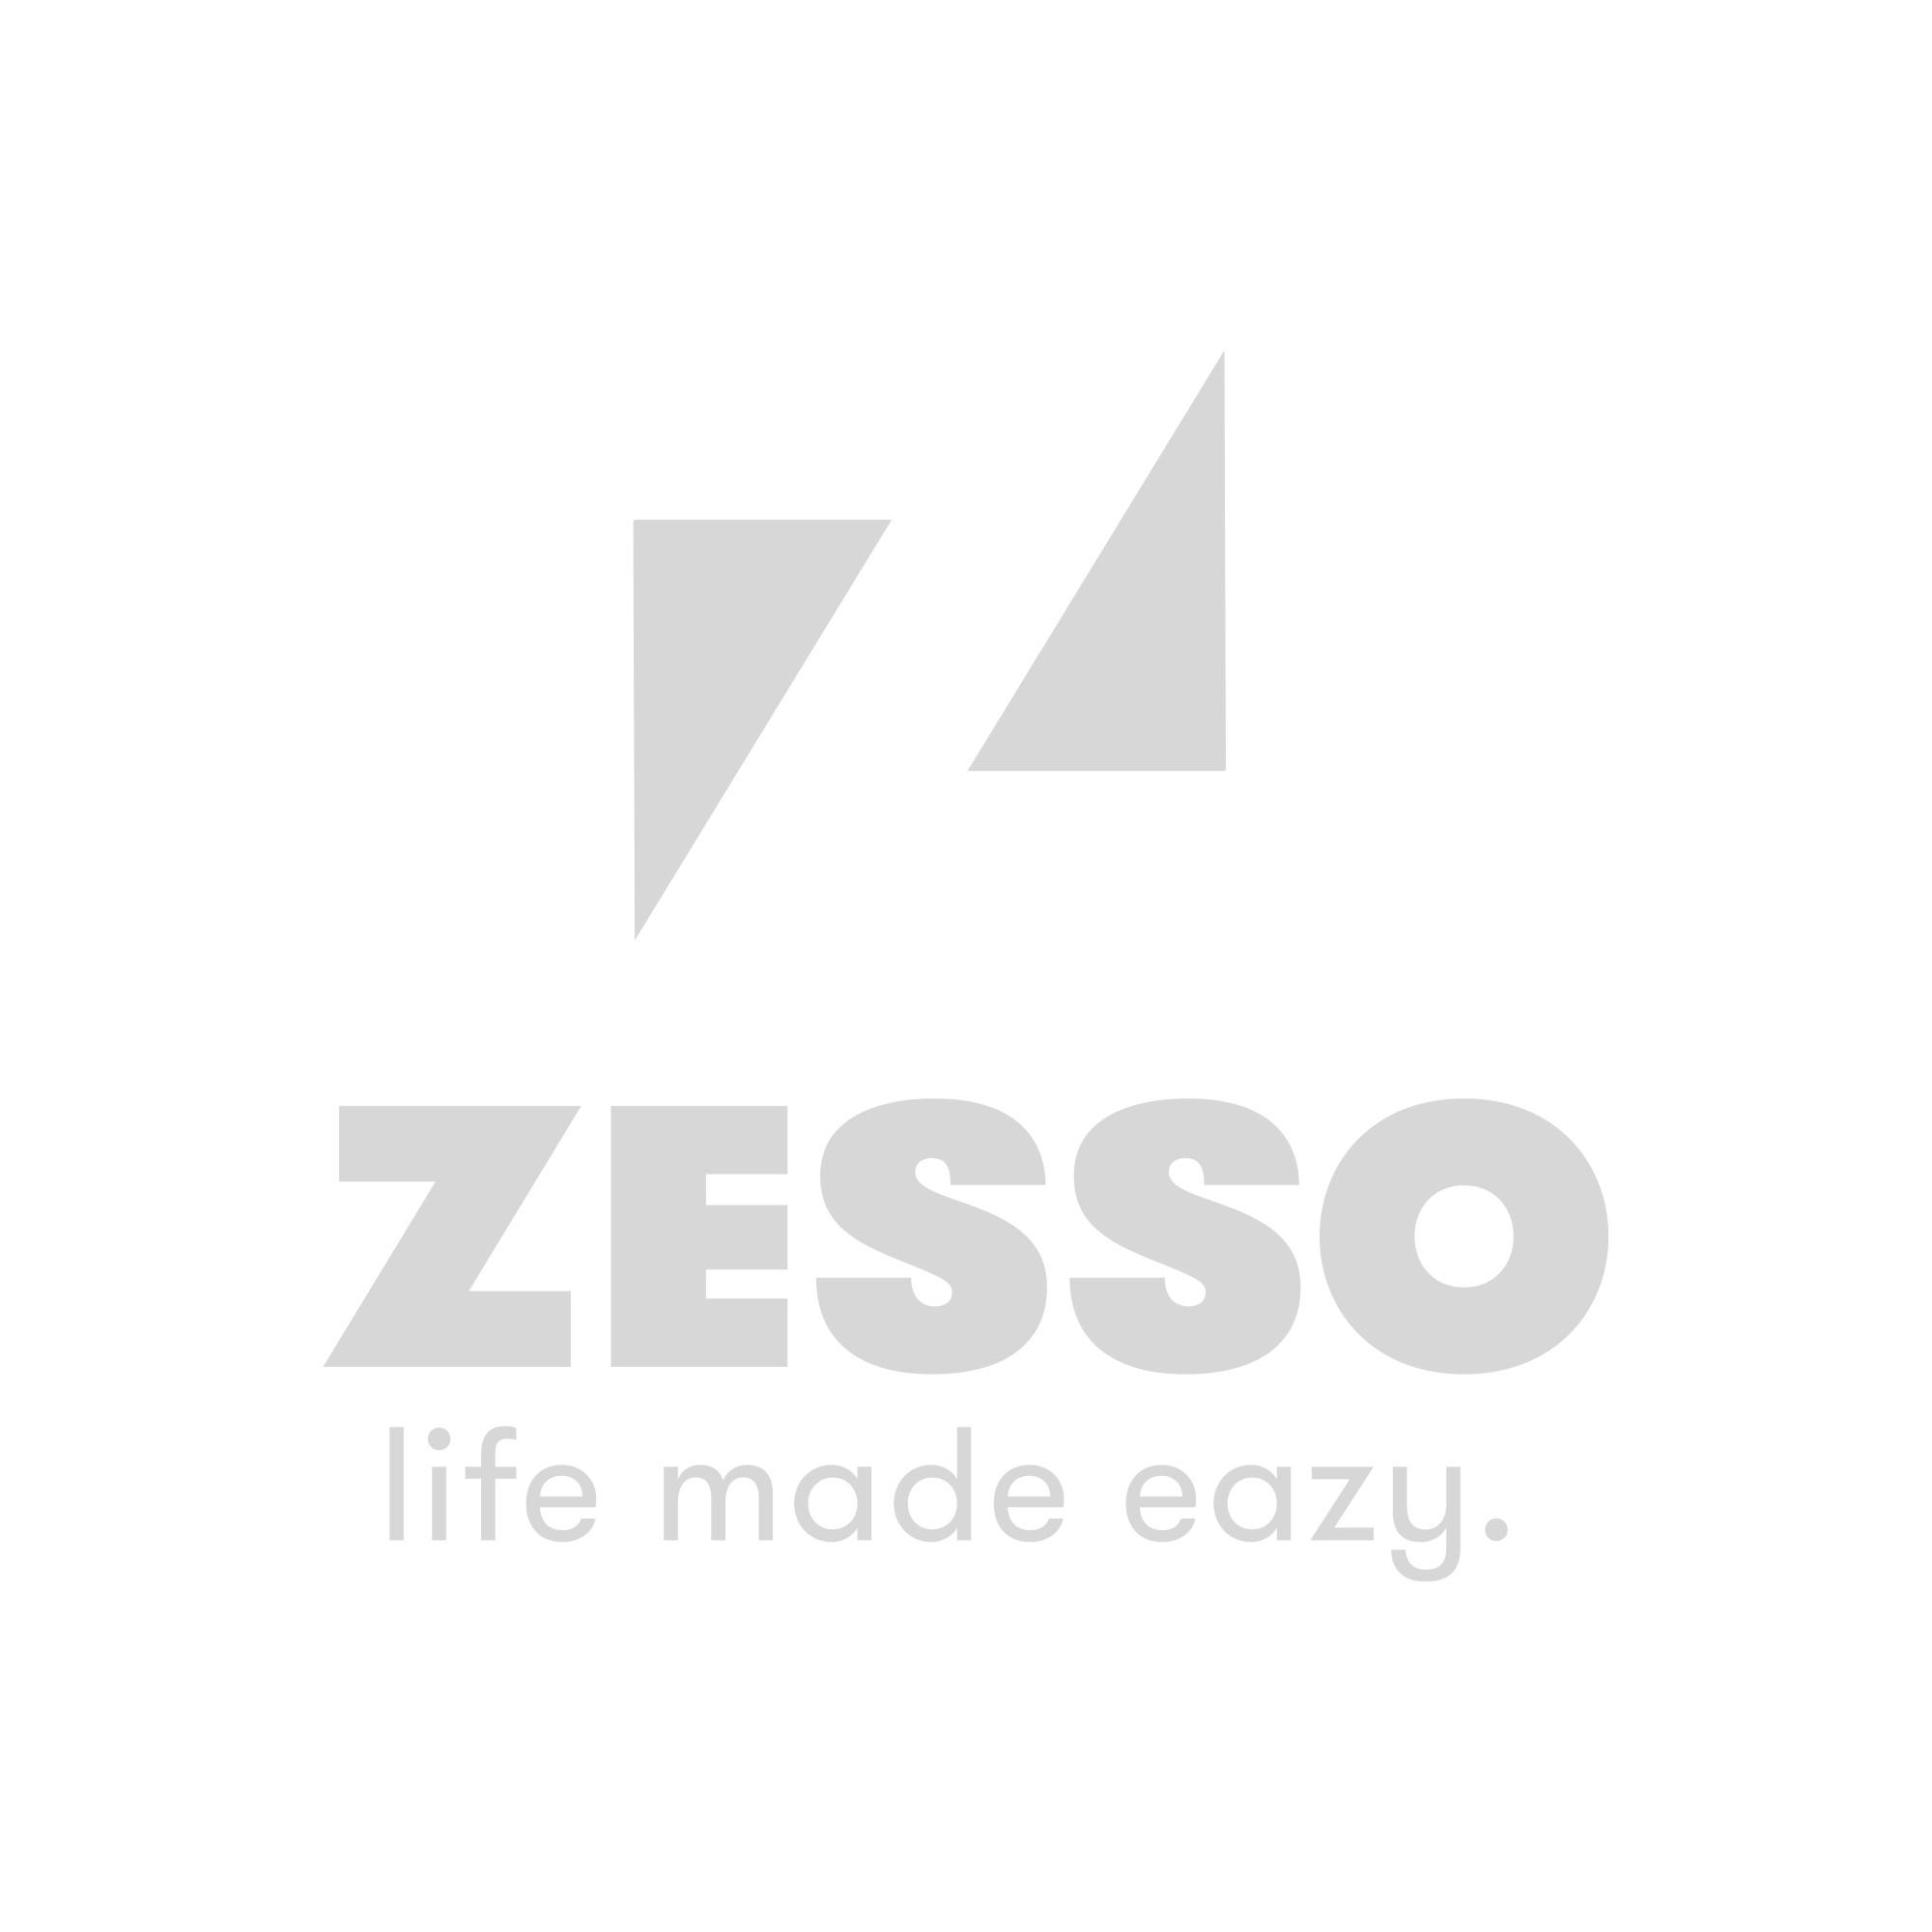 Trois Kilos Sept Bébé Pyjama 6 Mois Elephants & Owl